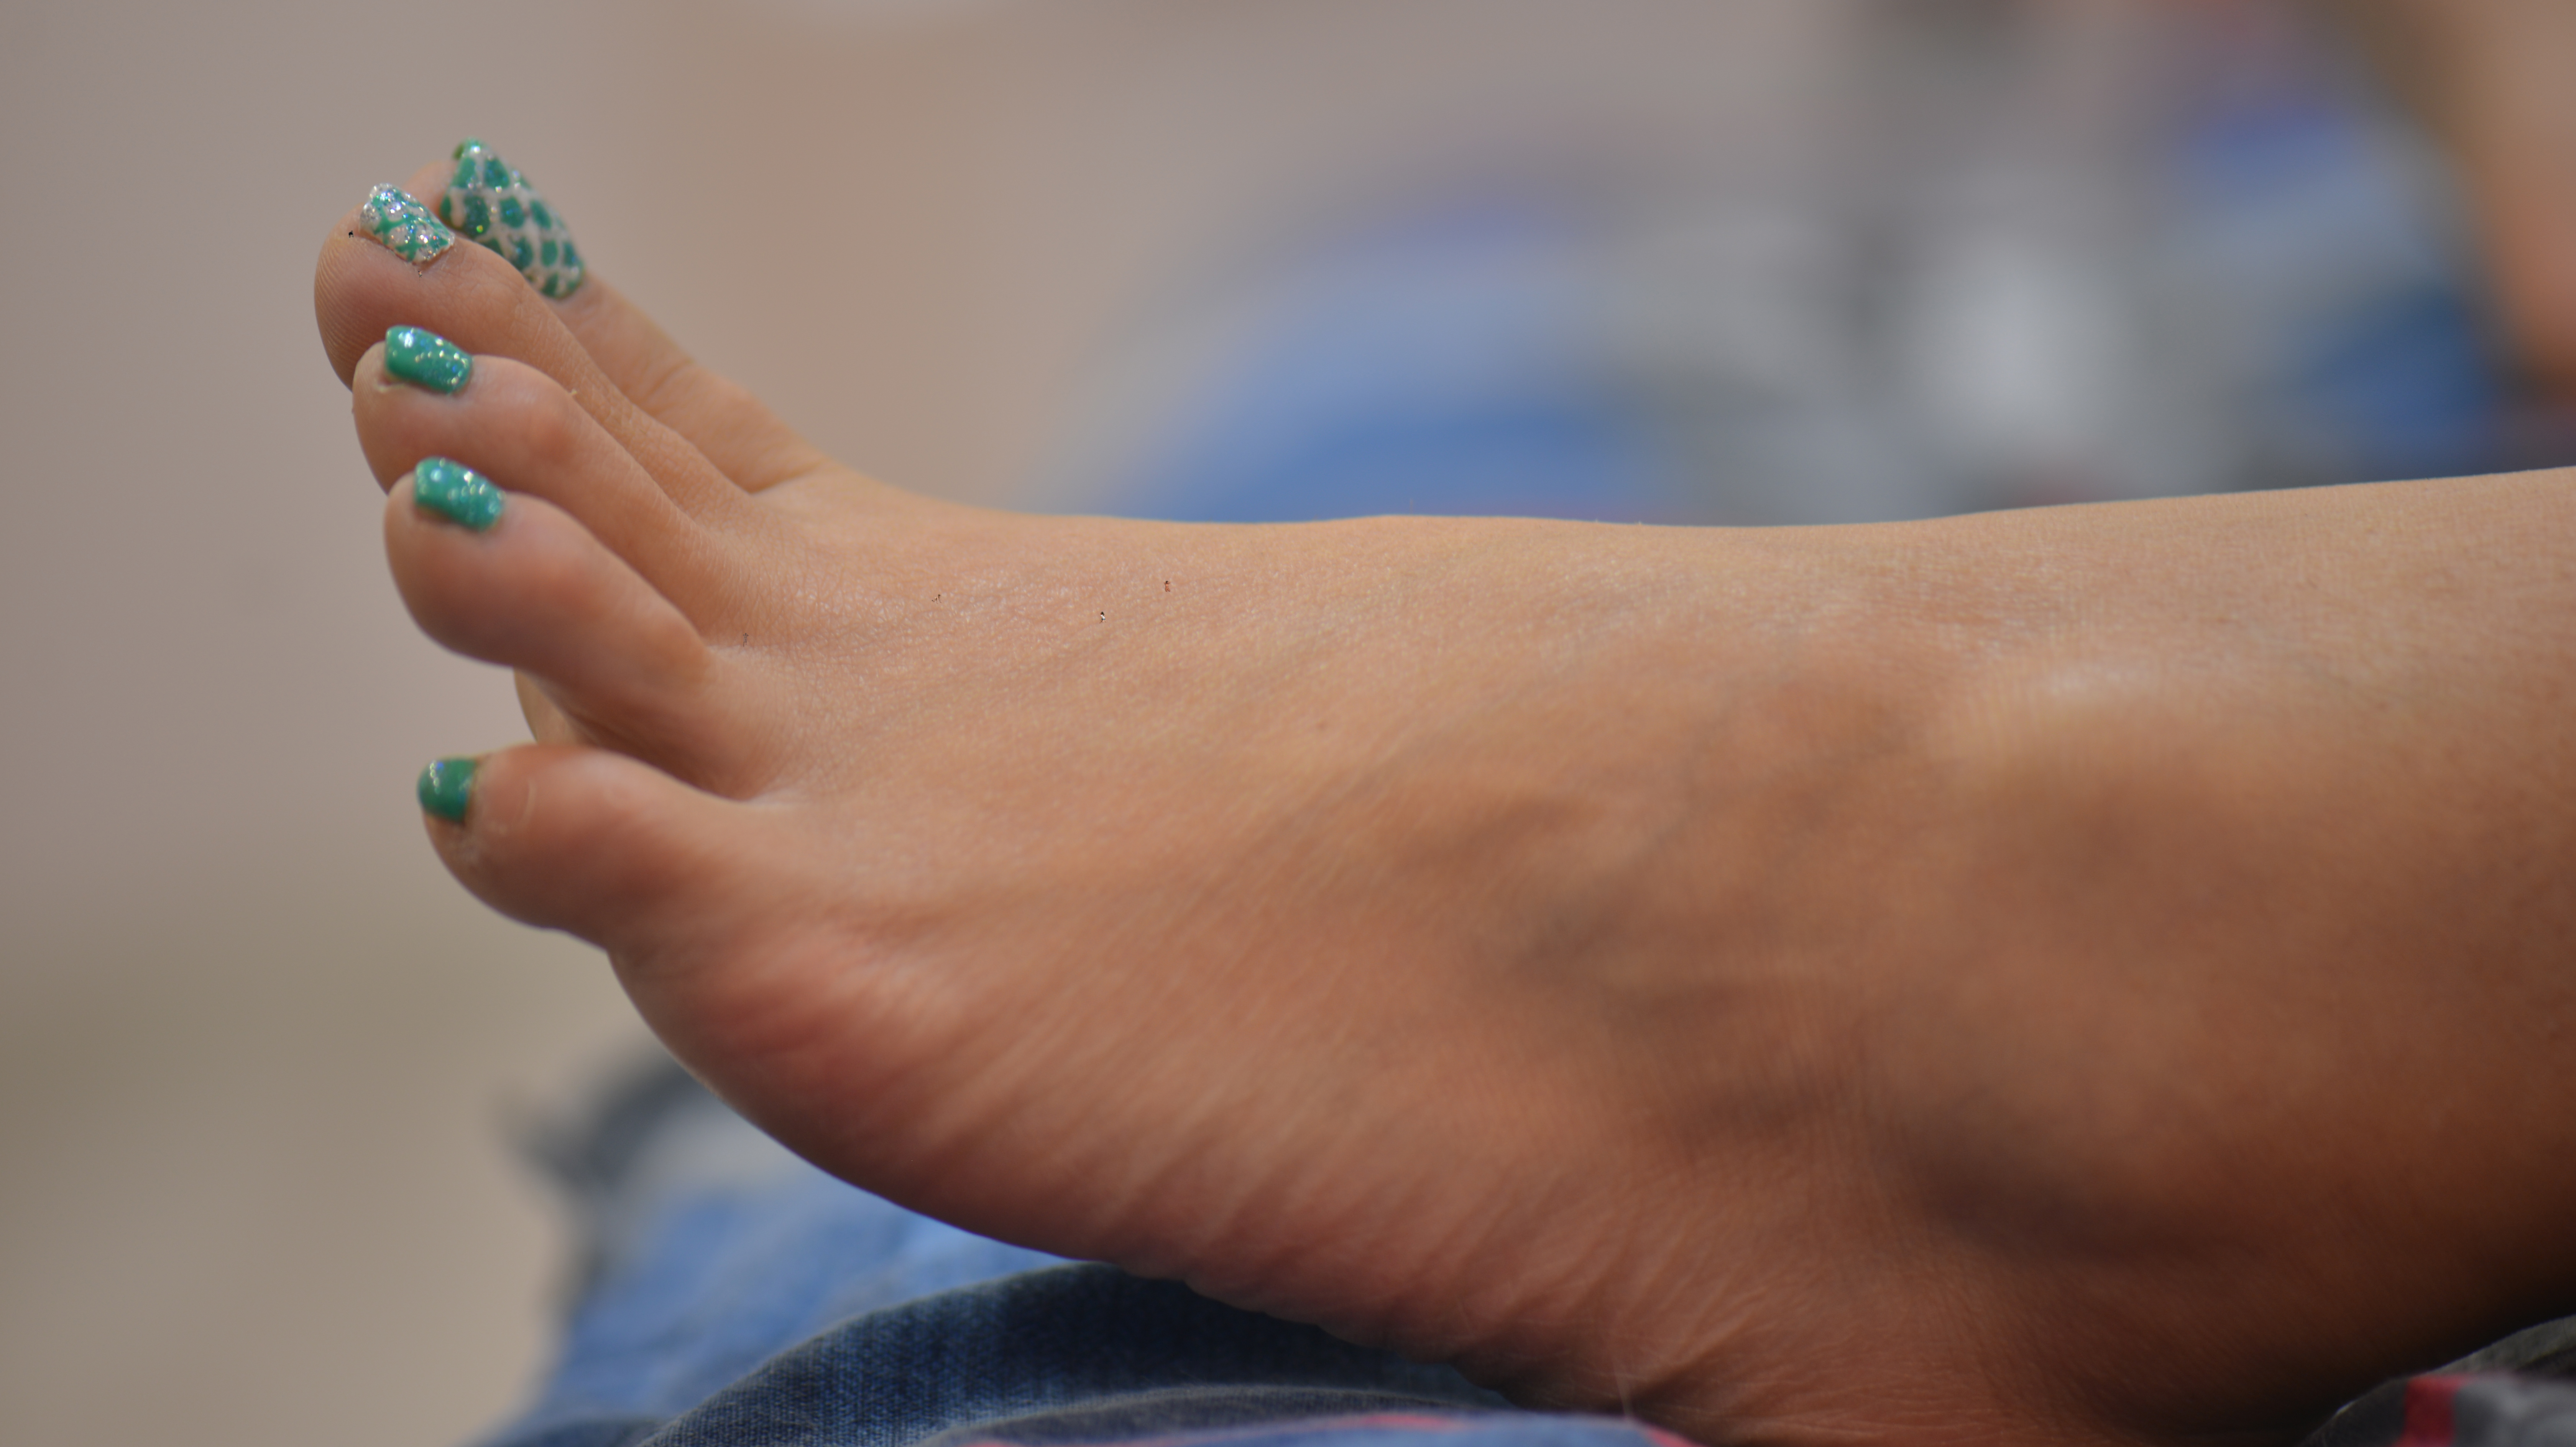 Embedded in foot 🏷️ something Montreal Neighborhood